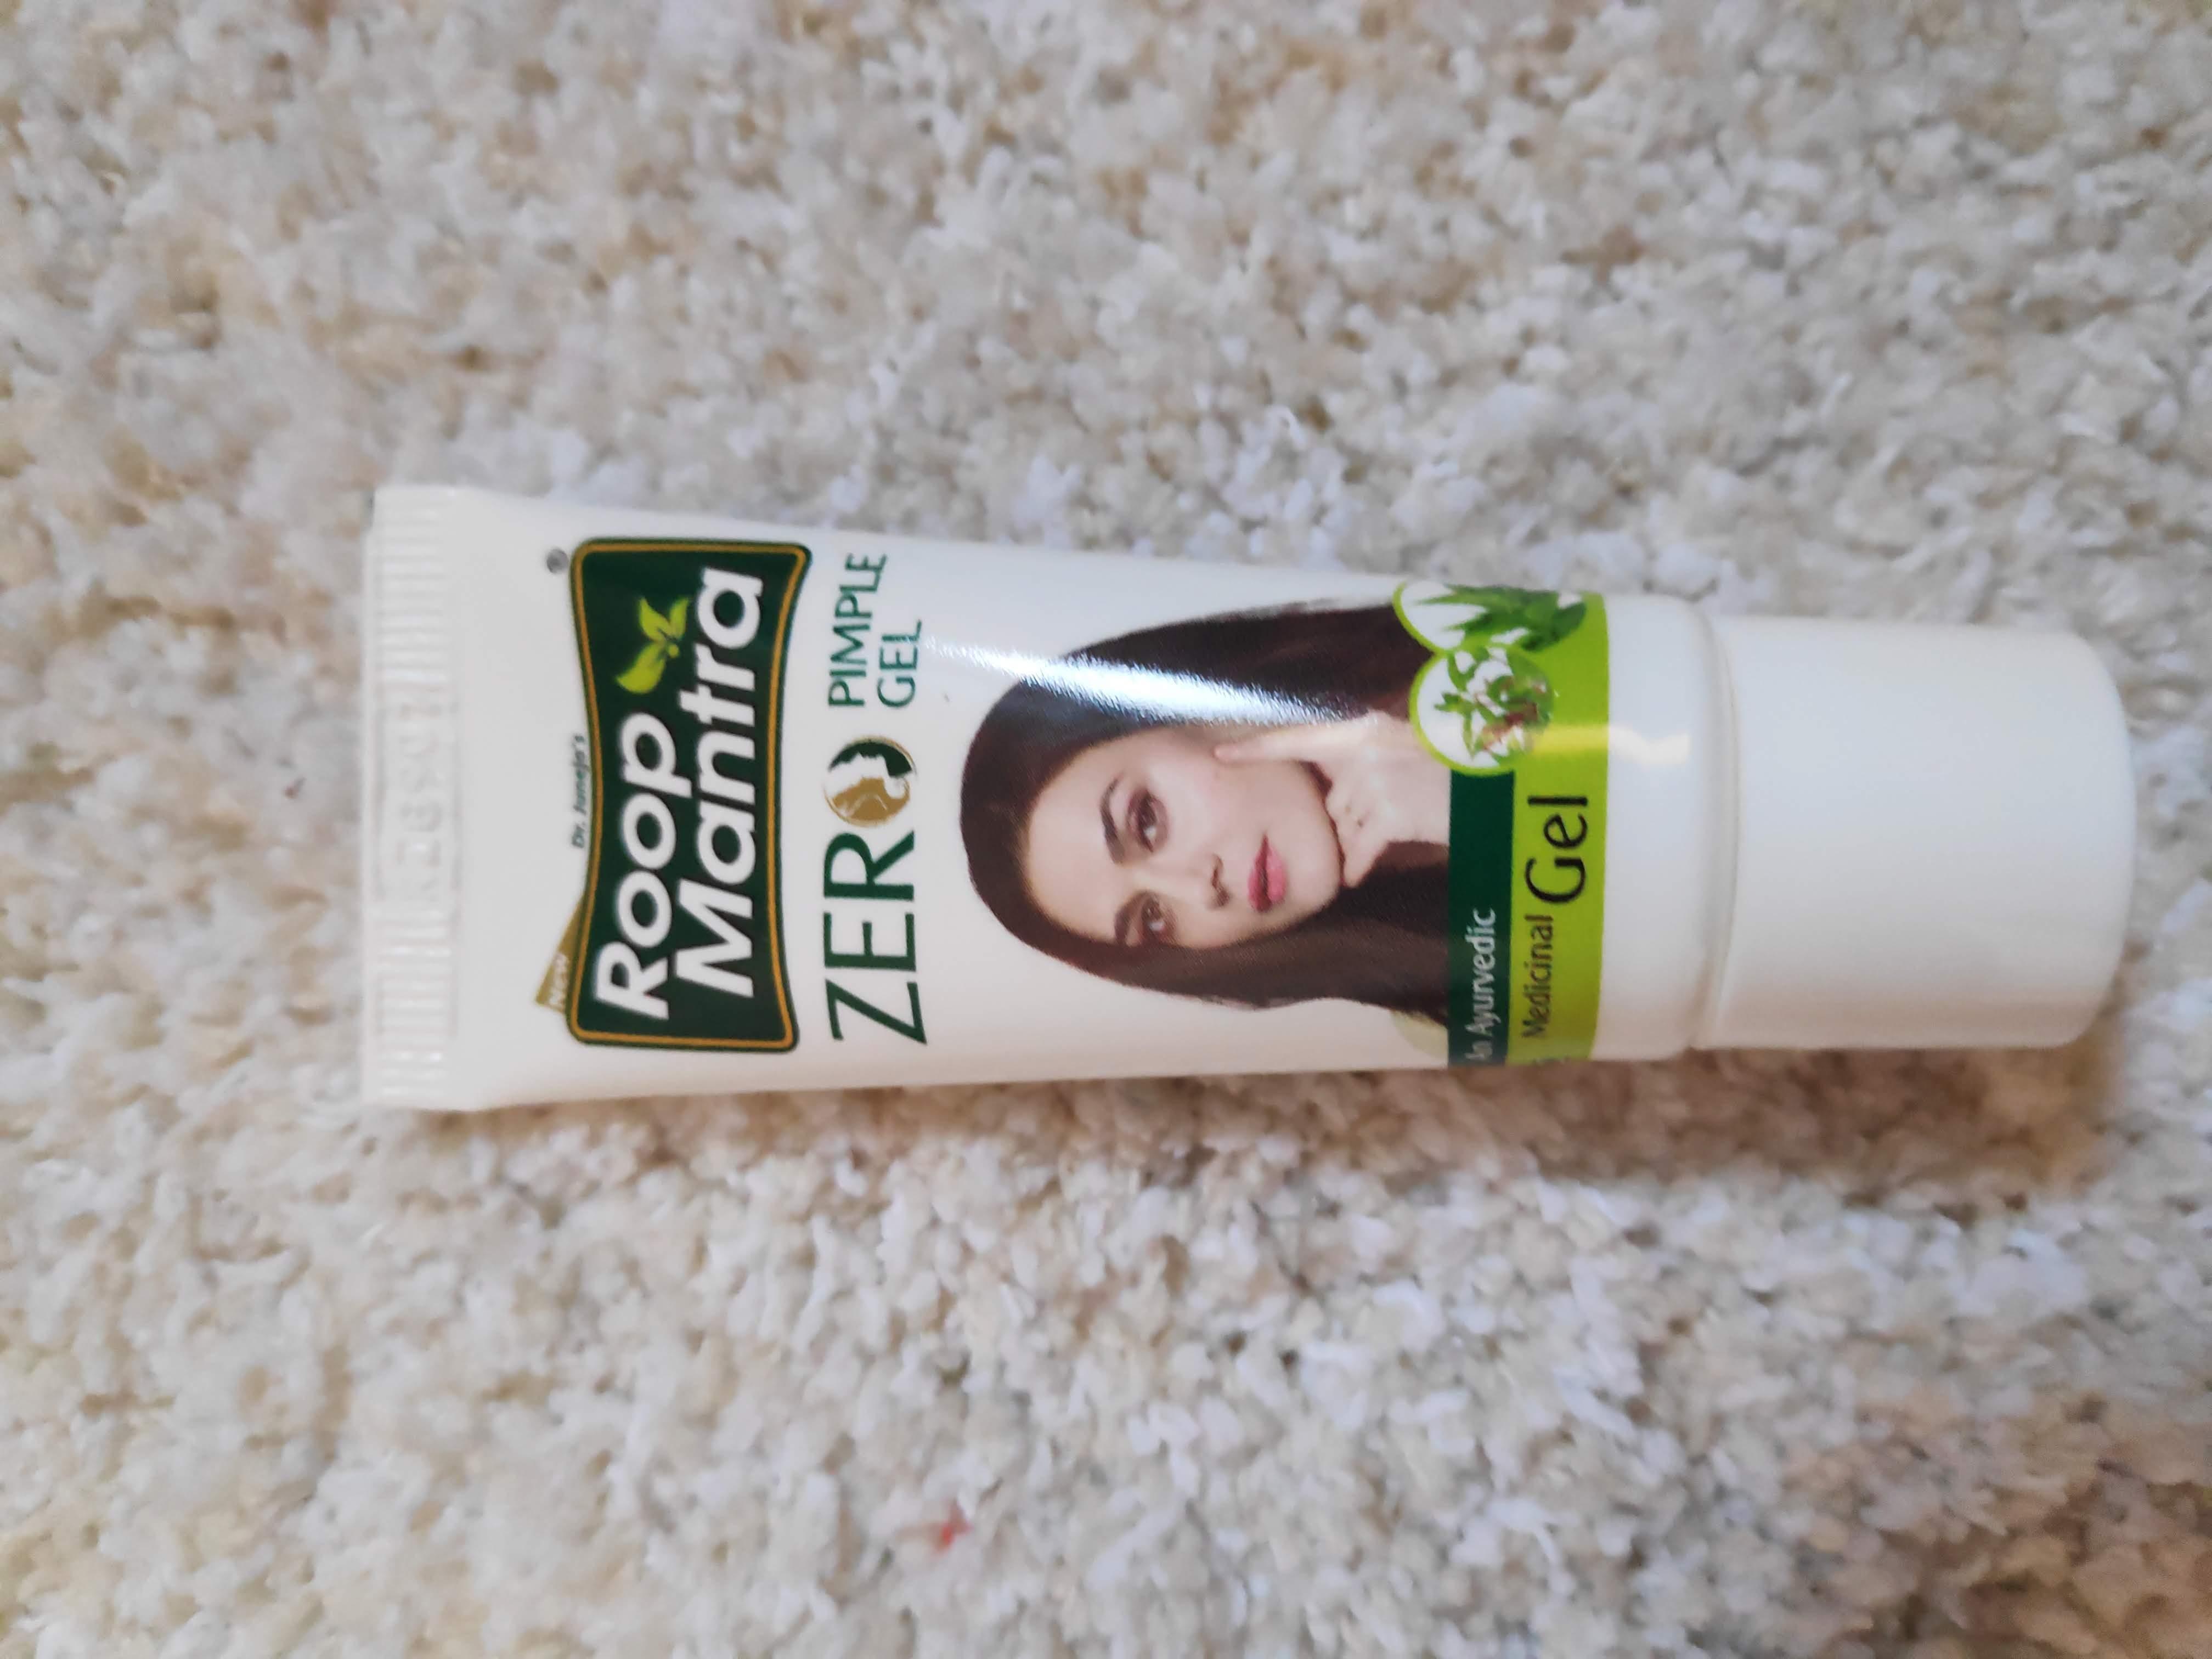 Roop Mantra Zero Pimple Gel-Perfect for pimple skin-By littleboymamma